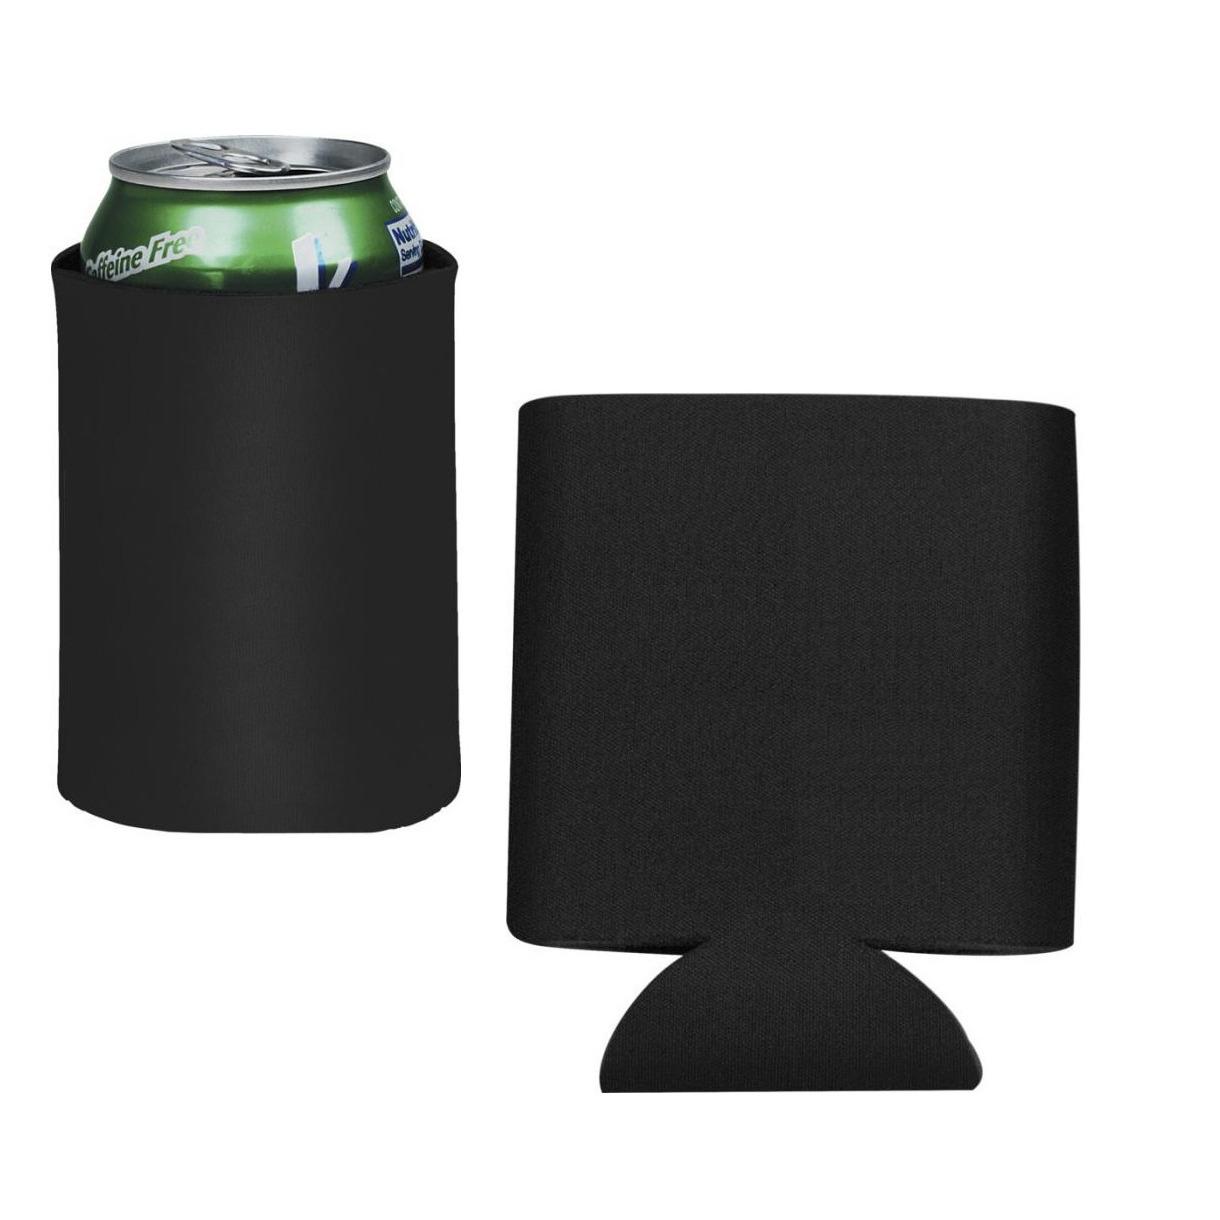 Voordeelset 20x Stuks opvouwbare zwarte blikjeskoelers/ koel hoesjes